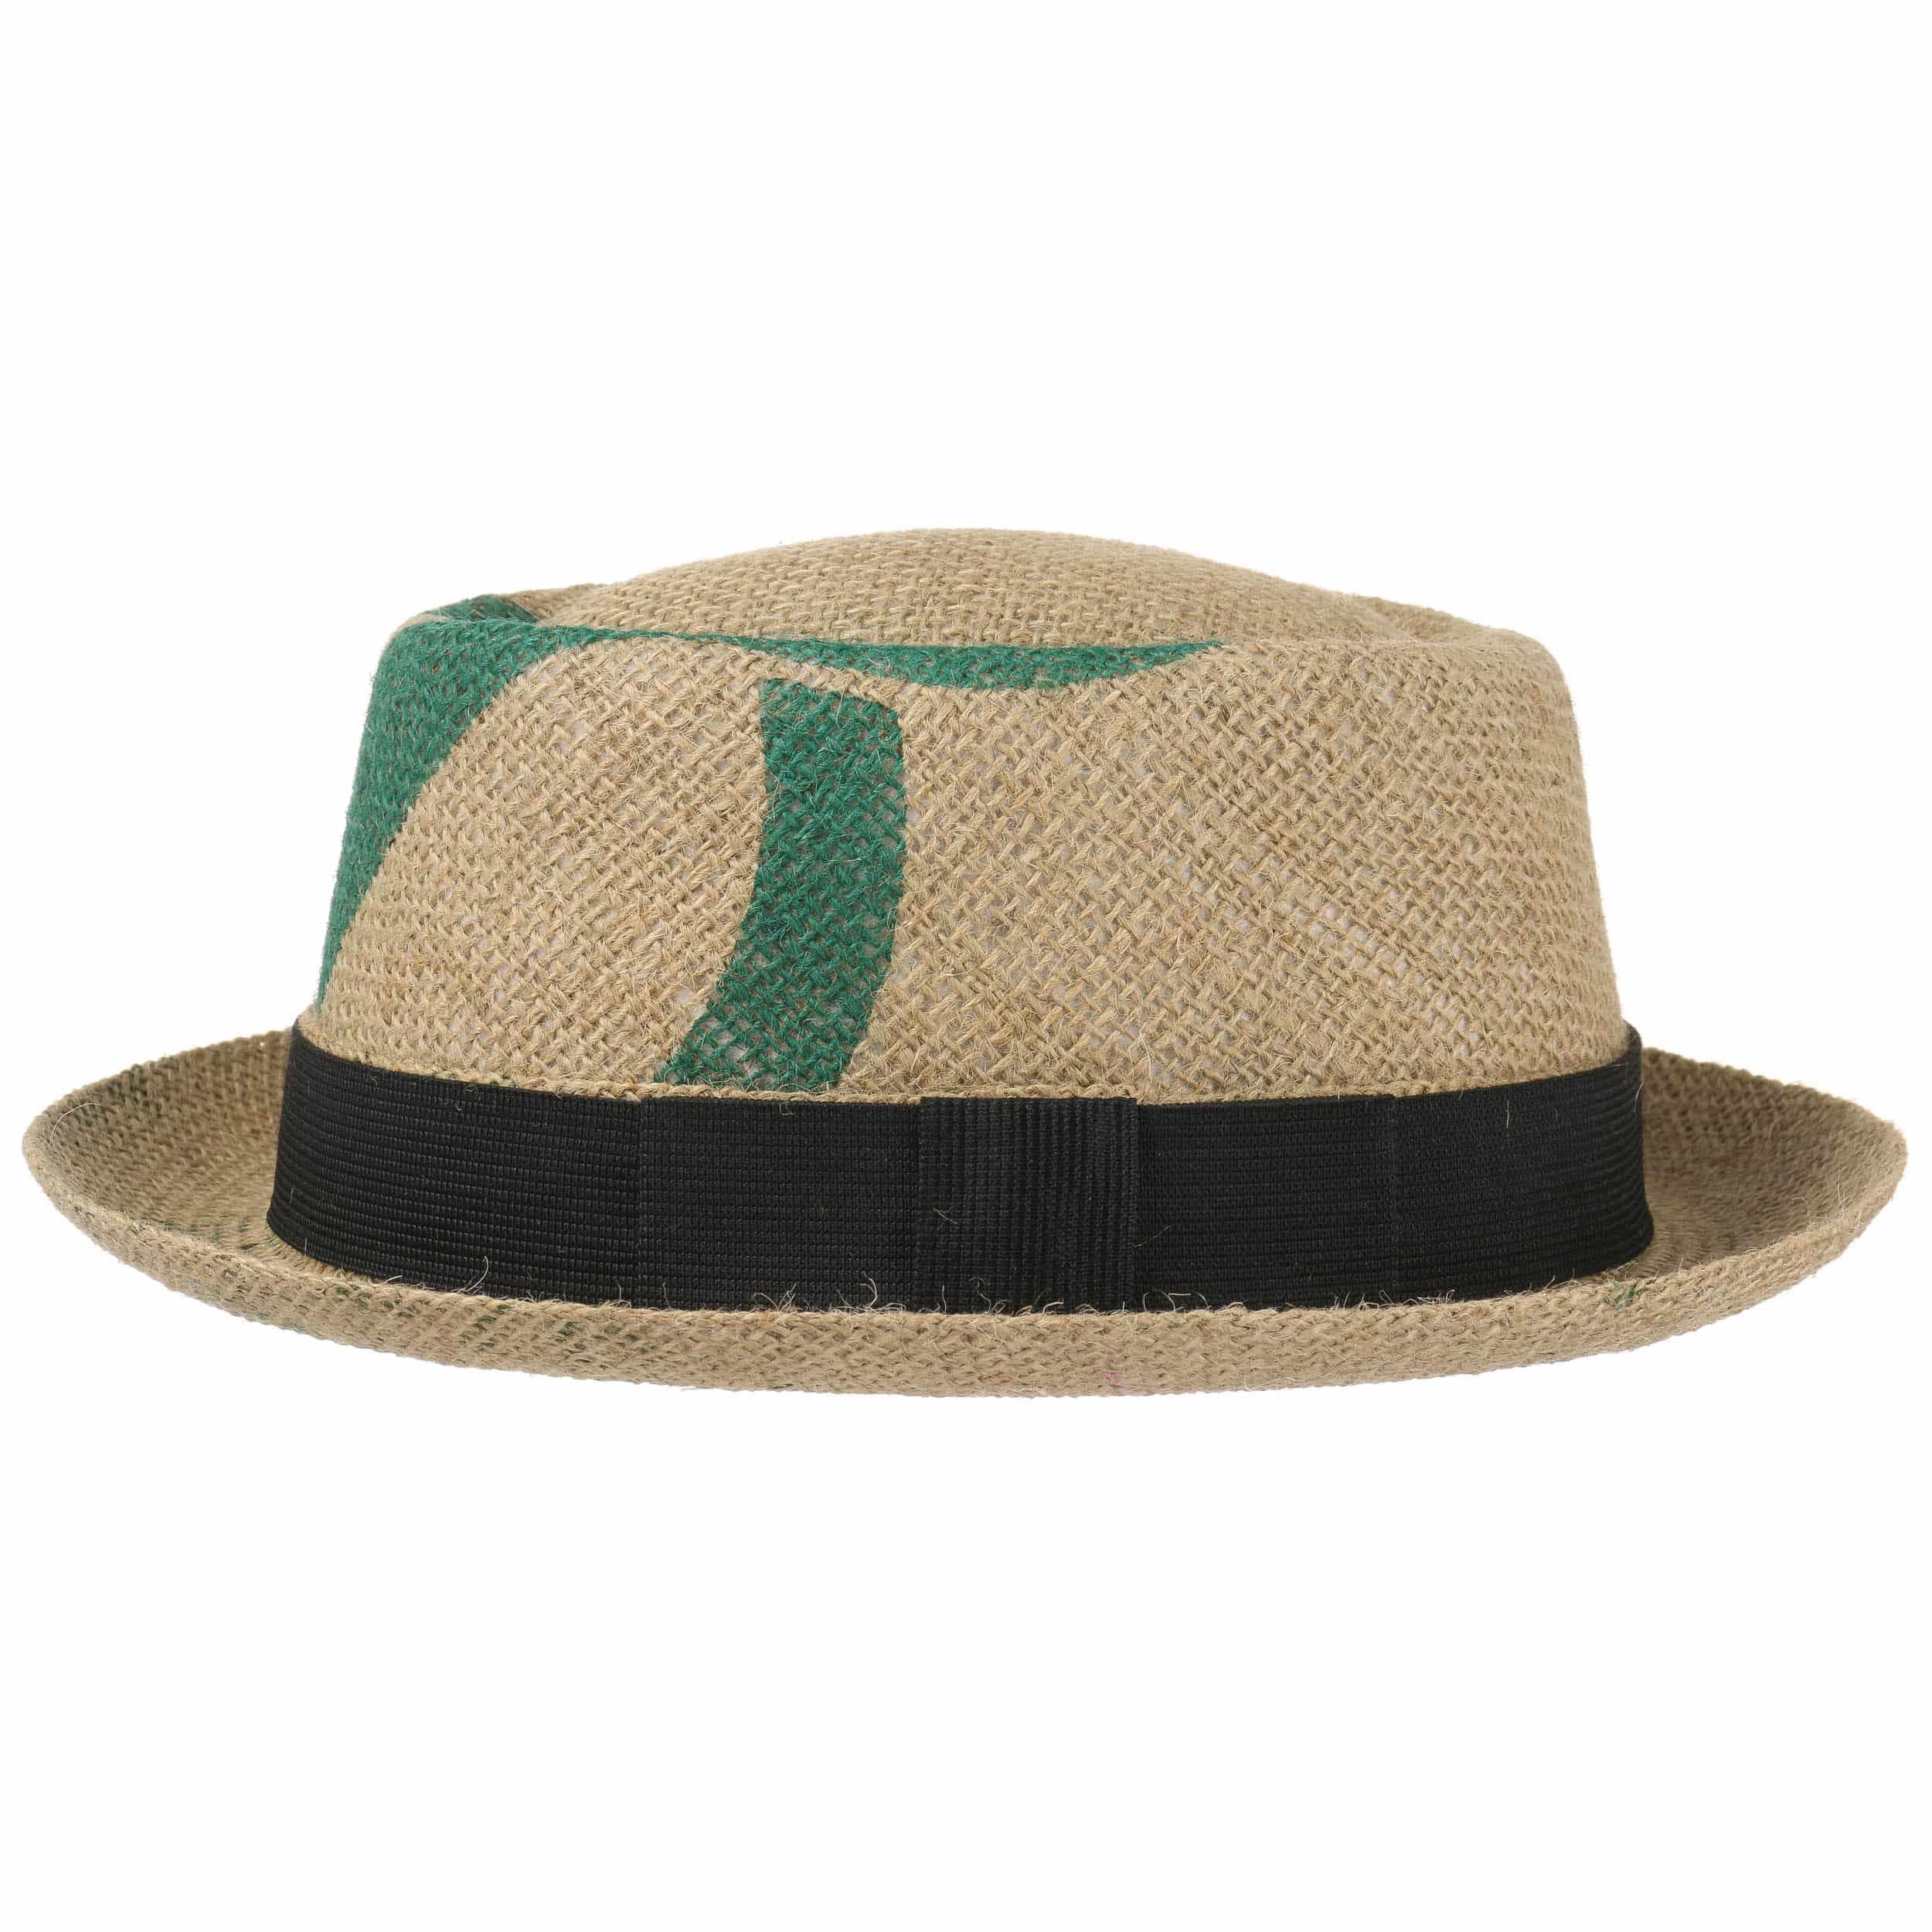 ... Café Pork Pie Hat by ReHats - nature-green 3 ... 54bbd62b1f5